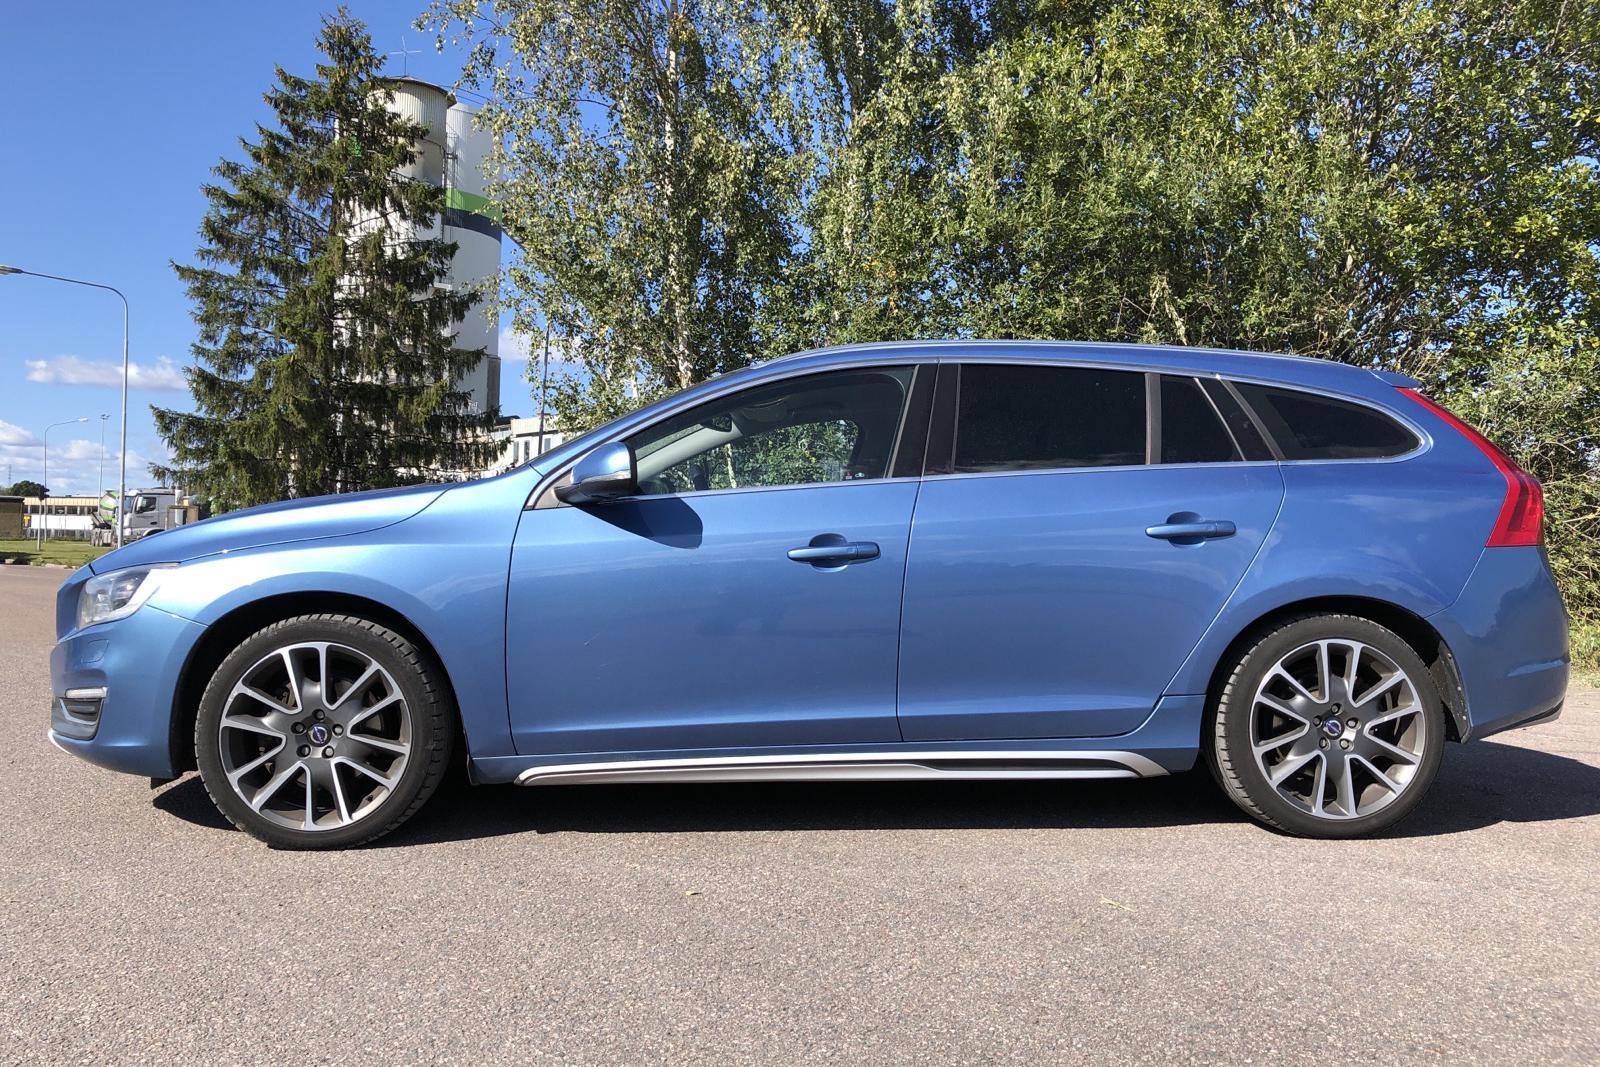 Volvo V60 D5 AWD (215hk) - 13 620 mil - Automat - blå - 2014